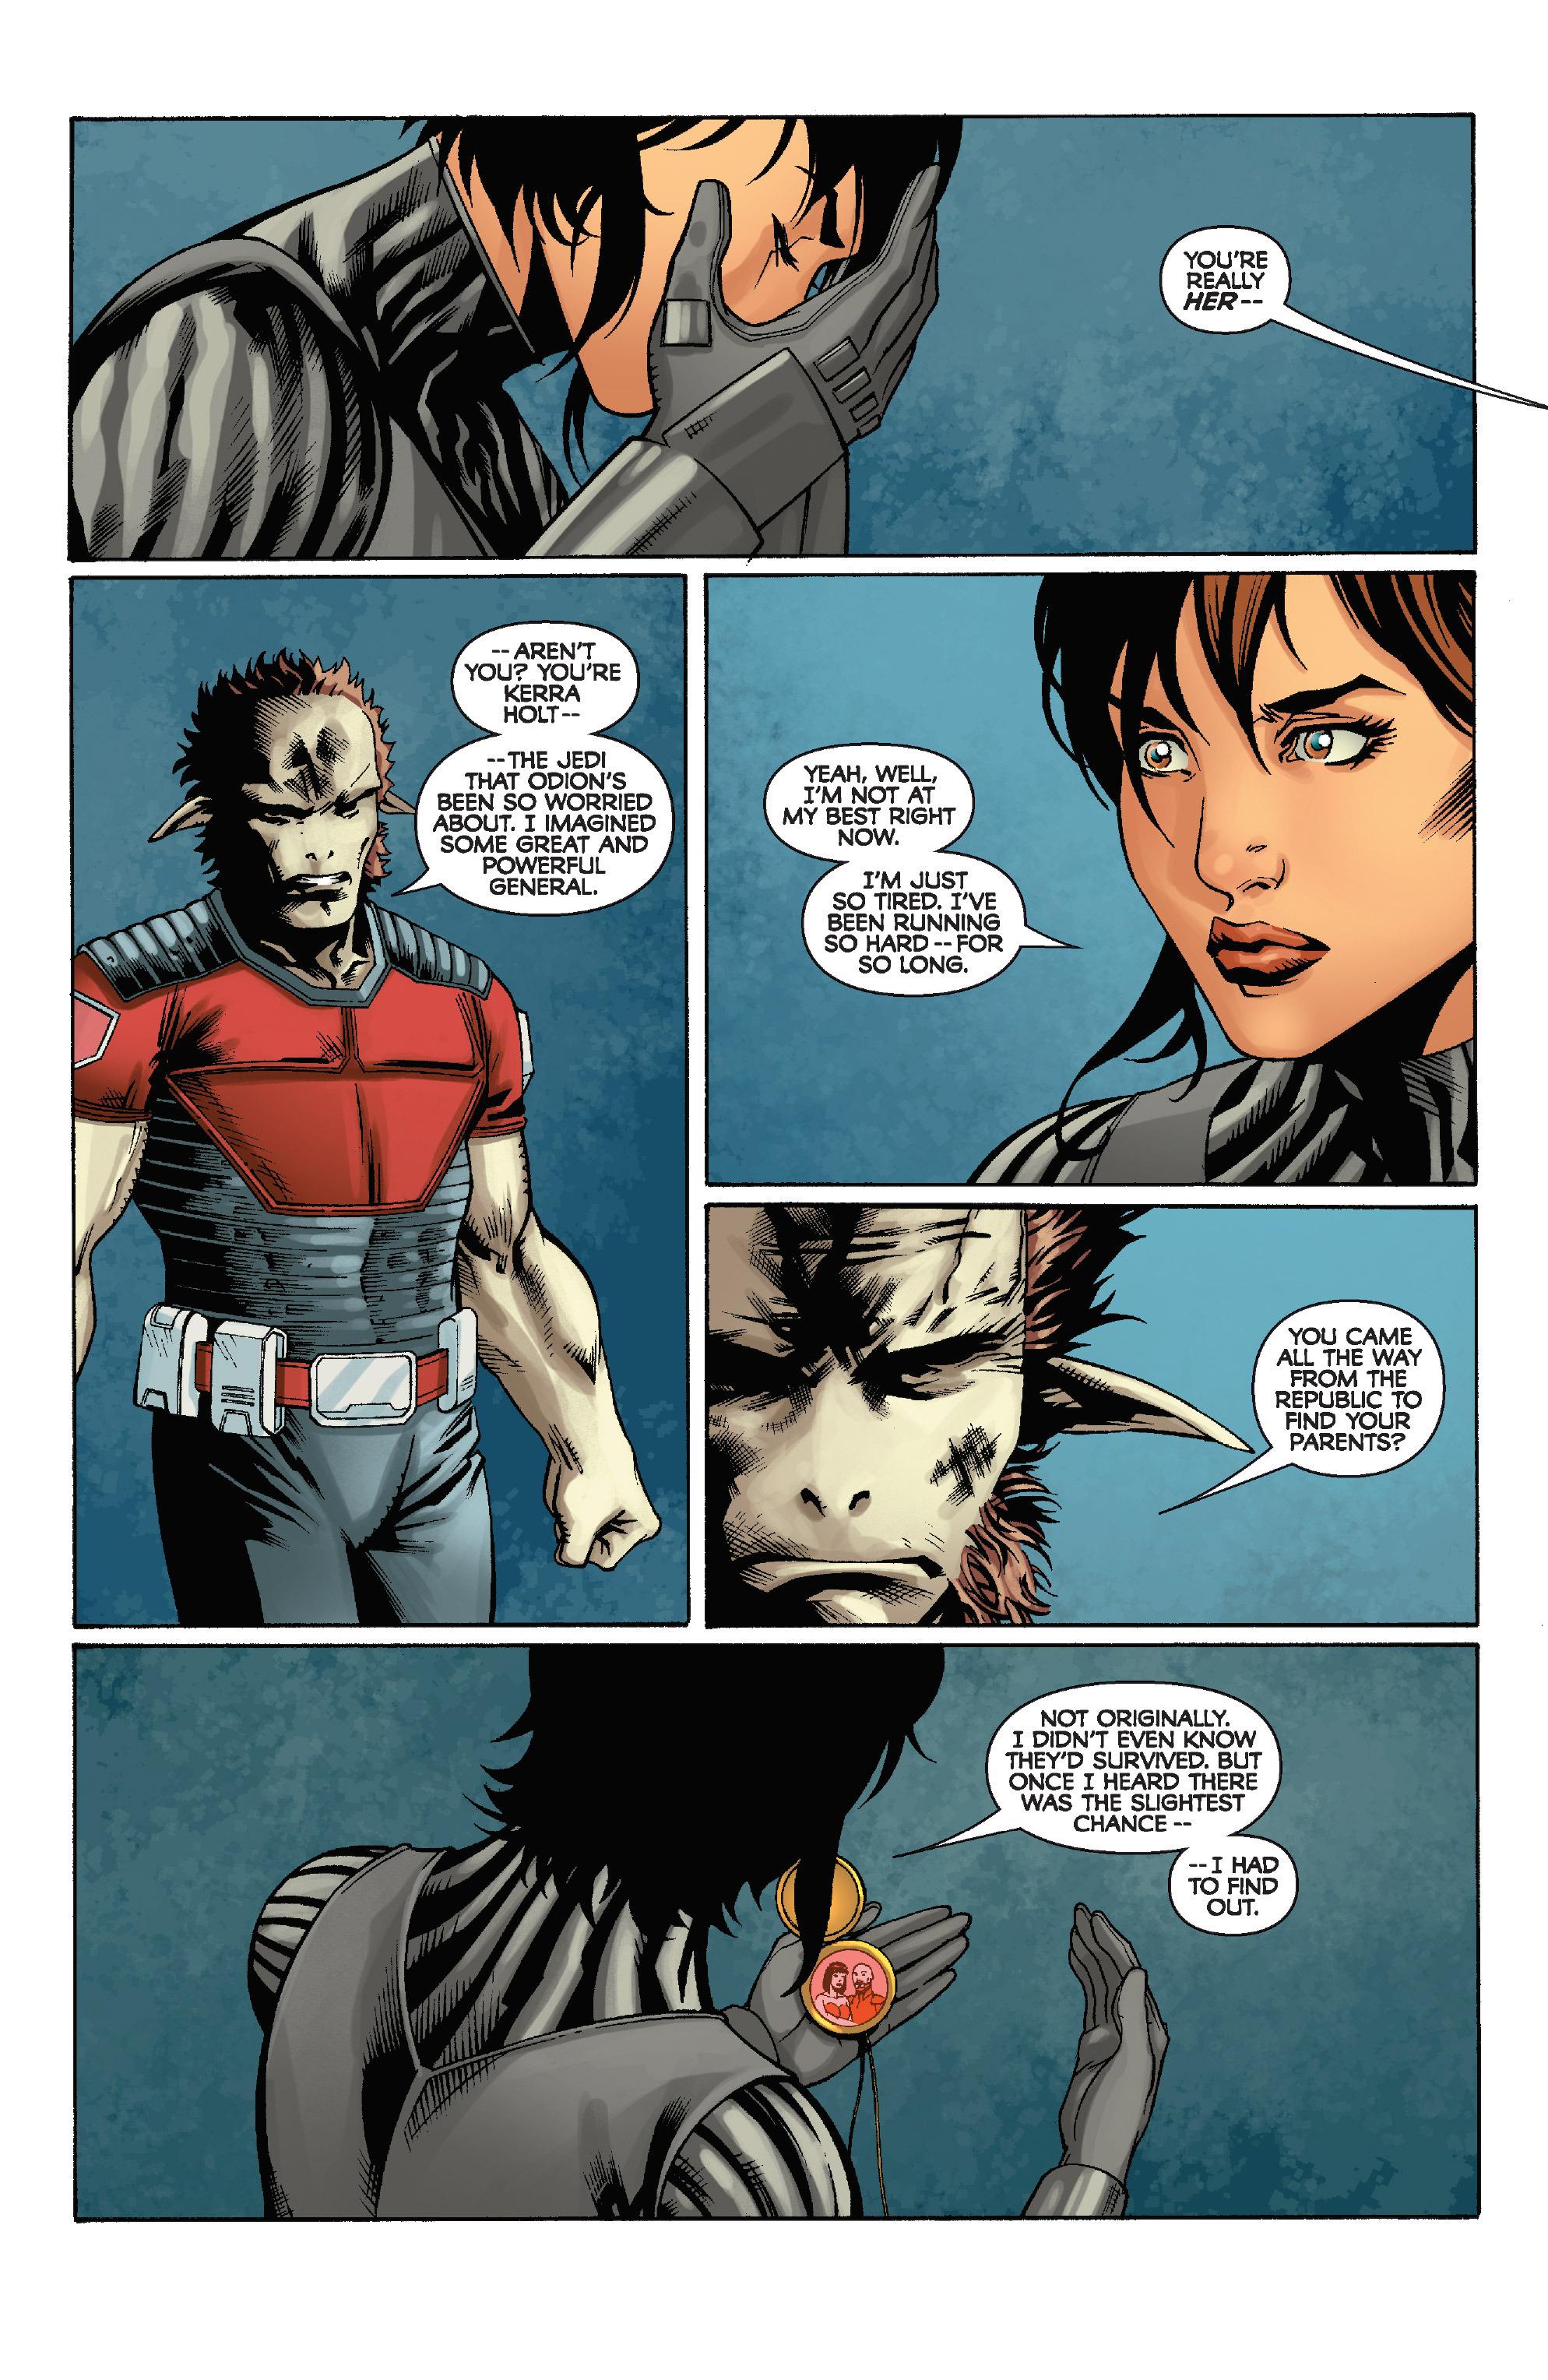 Read online Star Wars: Knight Errant - Escape comic -  Issue #4 - 18